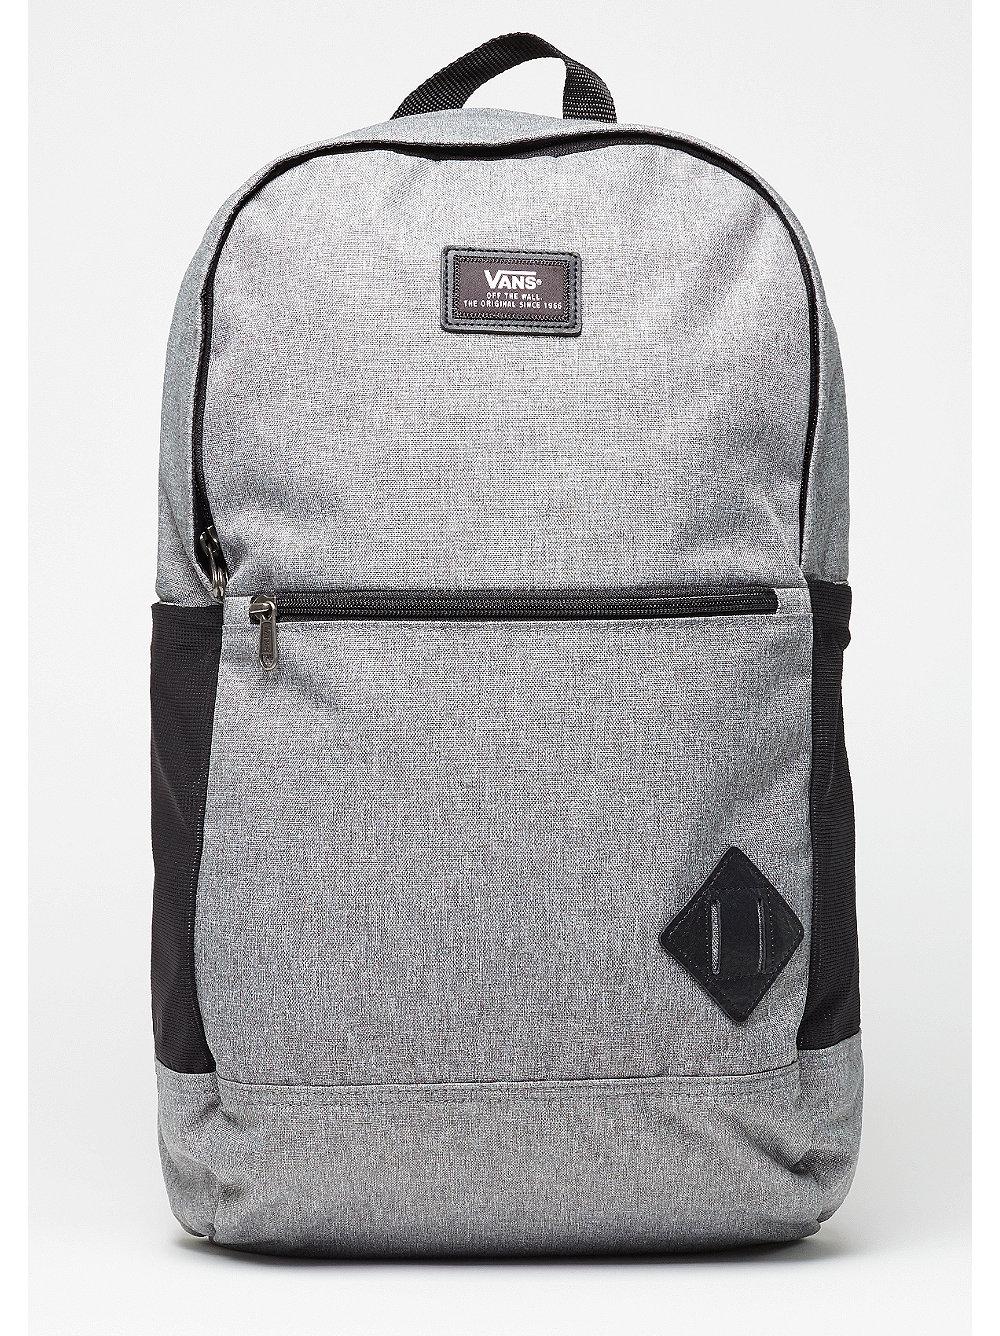 vans van doren backpack preisvergleich rucksack. Black Bedroom Furniture Sets. Home Design Ideas